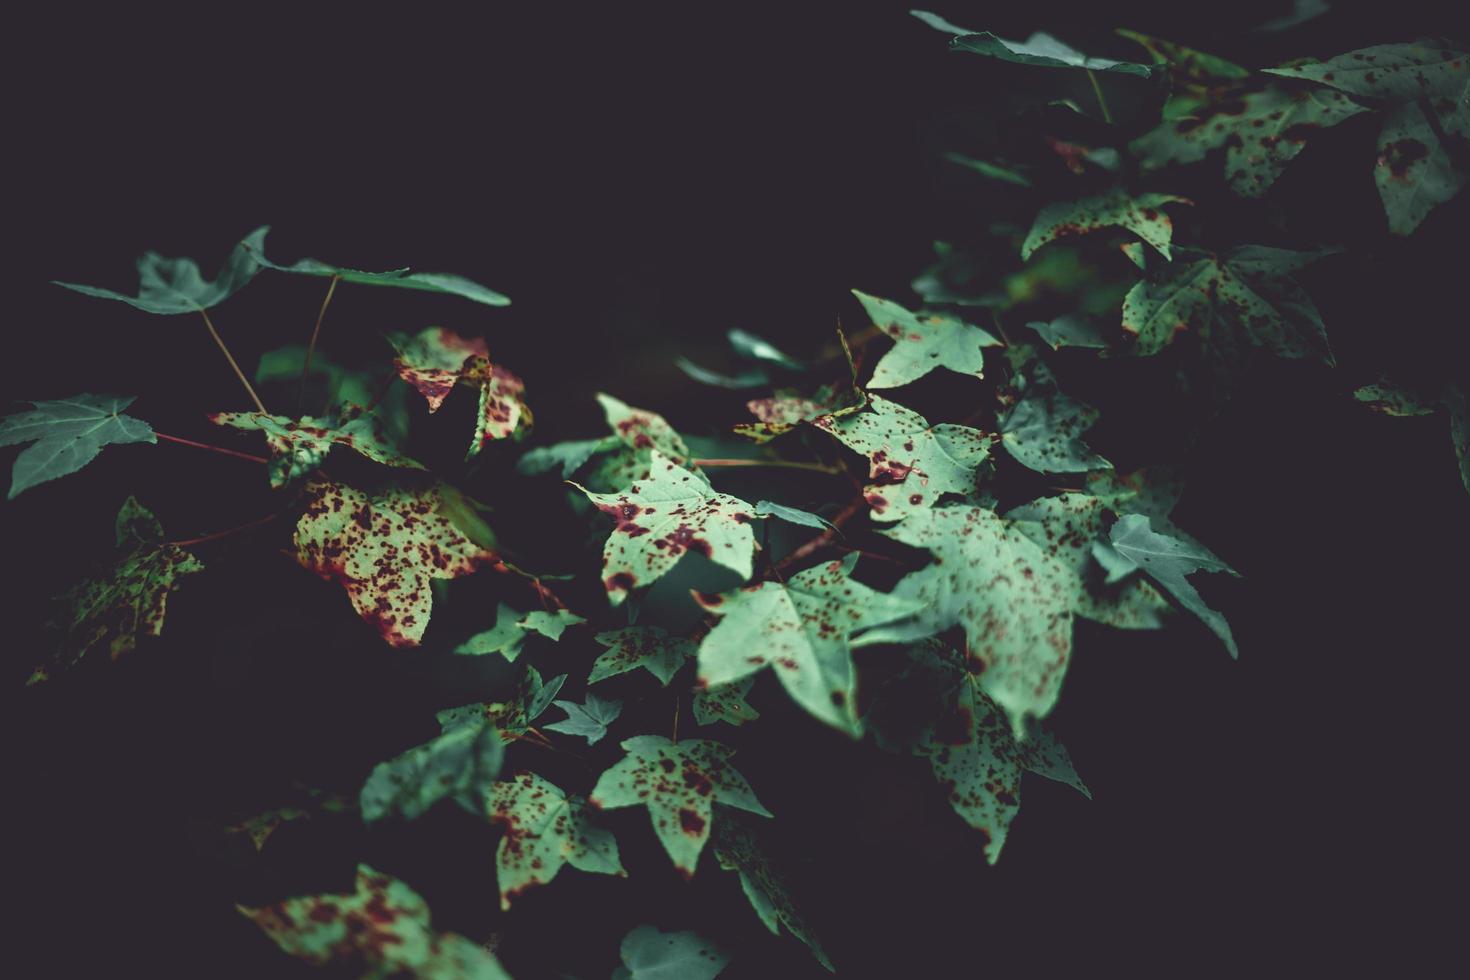 Sweetgum leaves in the Fall photo